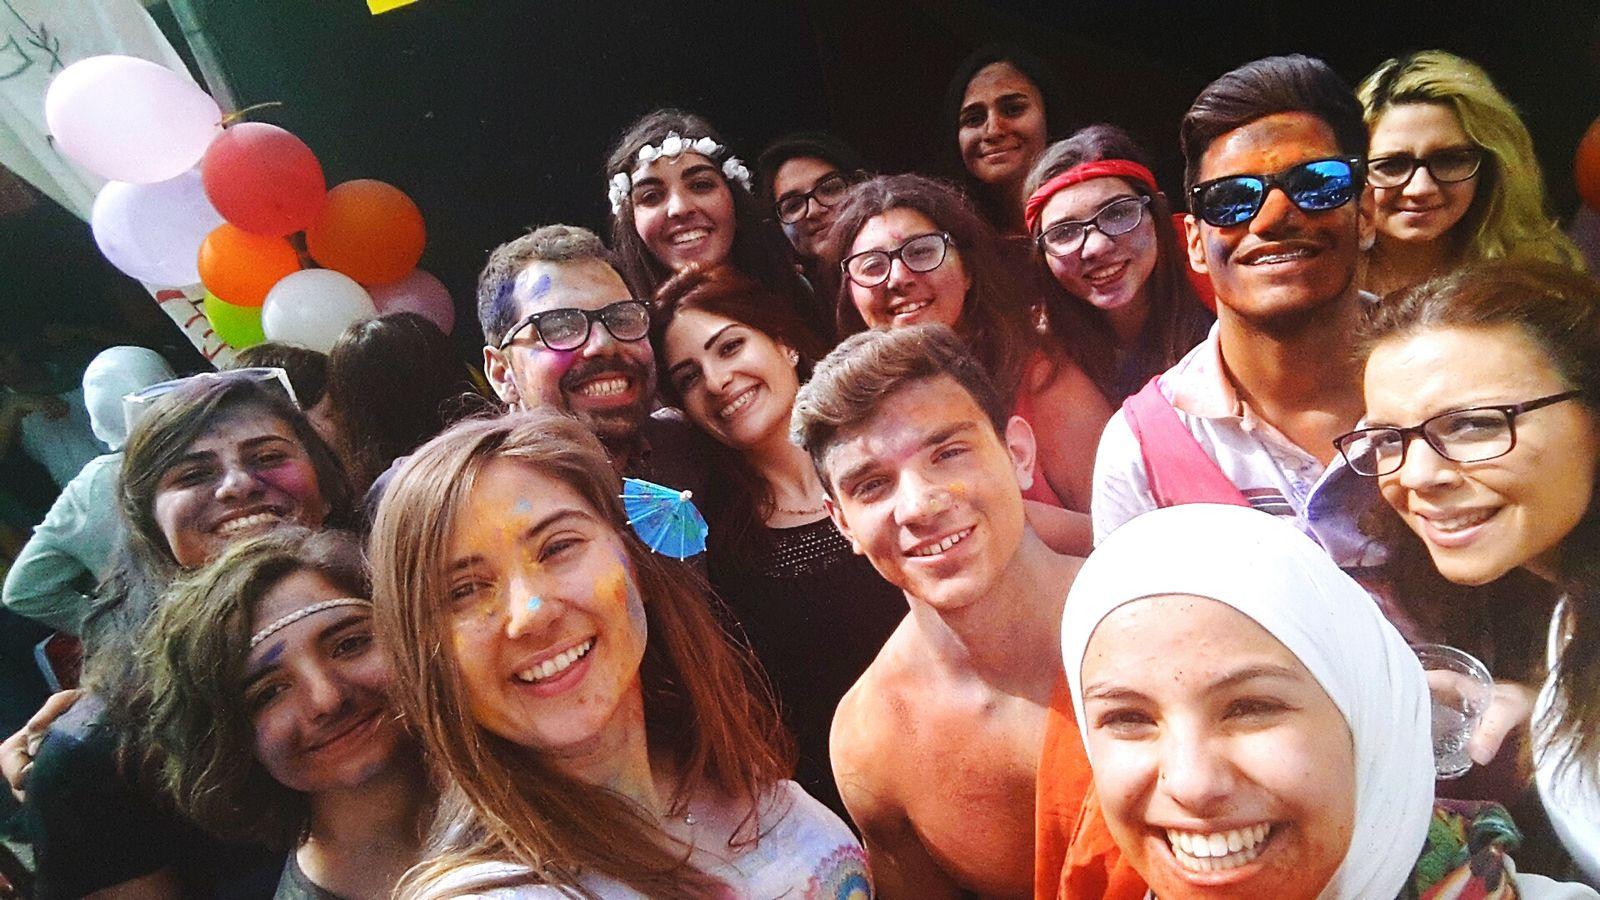 Holi Powder Colours Friends ❤ Love MUN GCLAUMUN Global Village